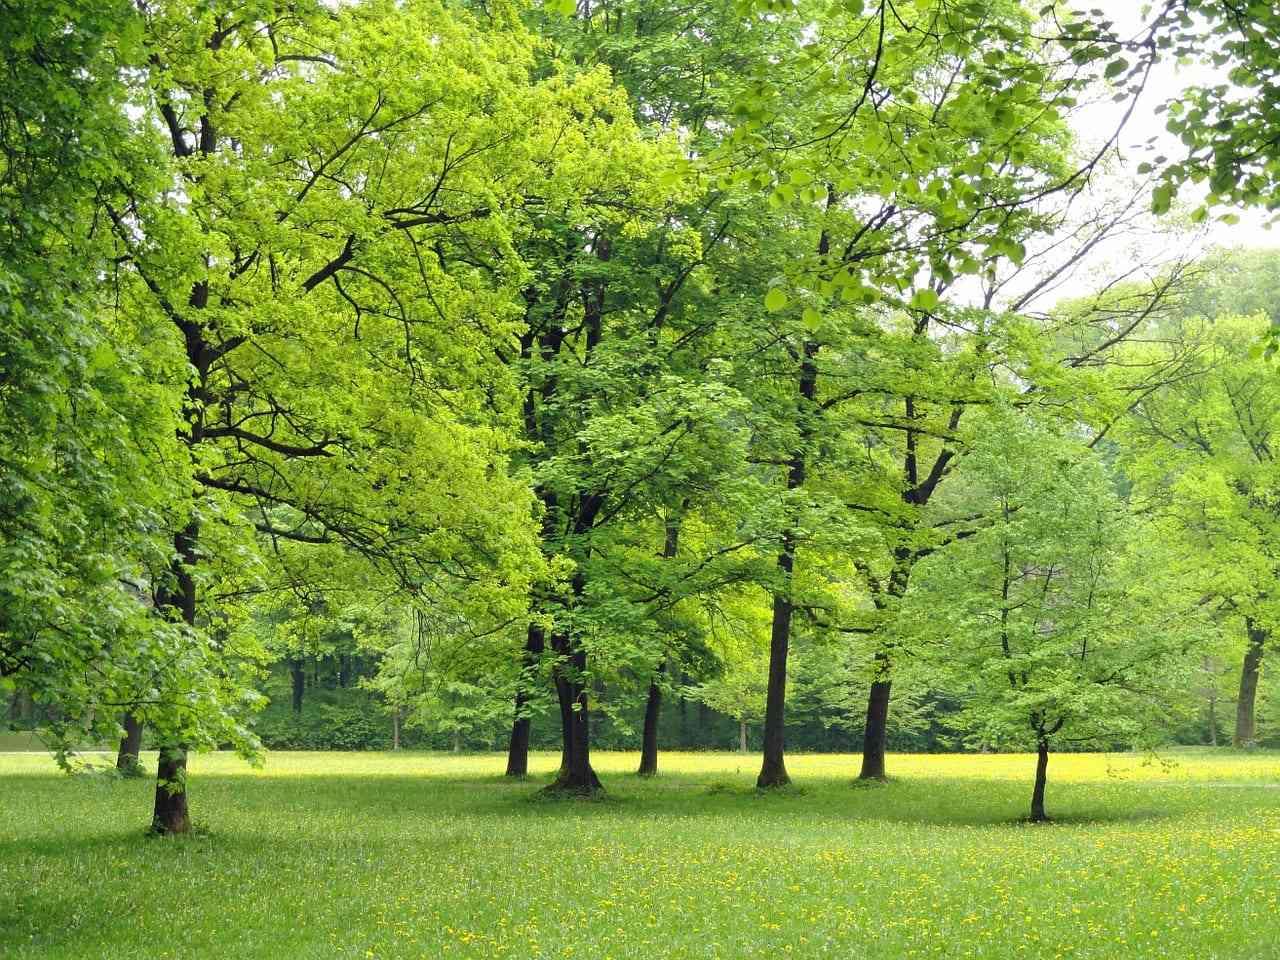 Plantar árboles para vivir